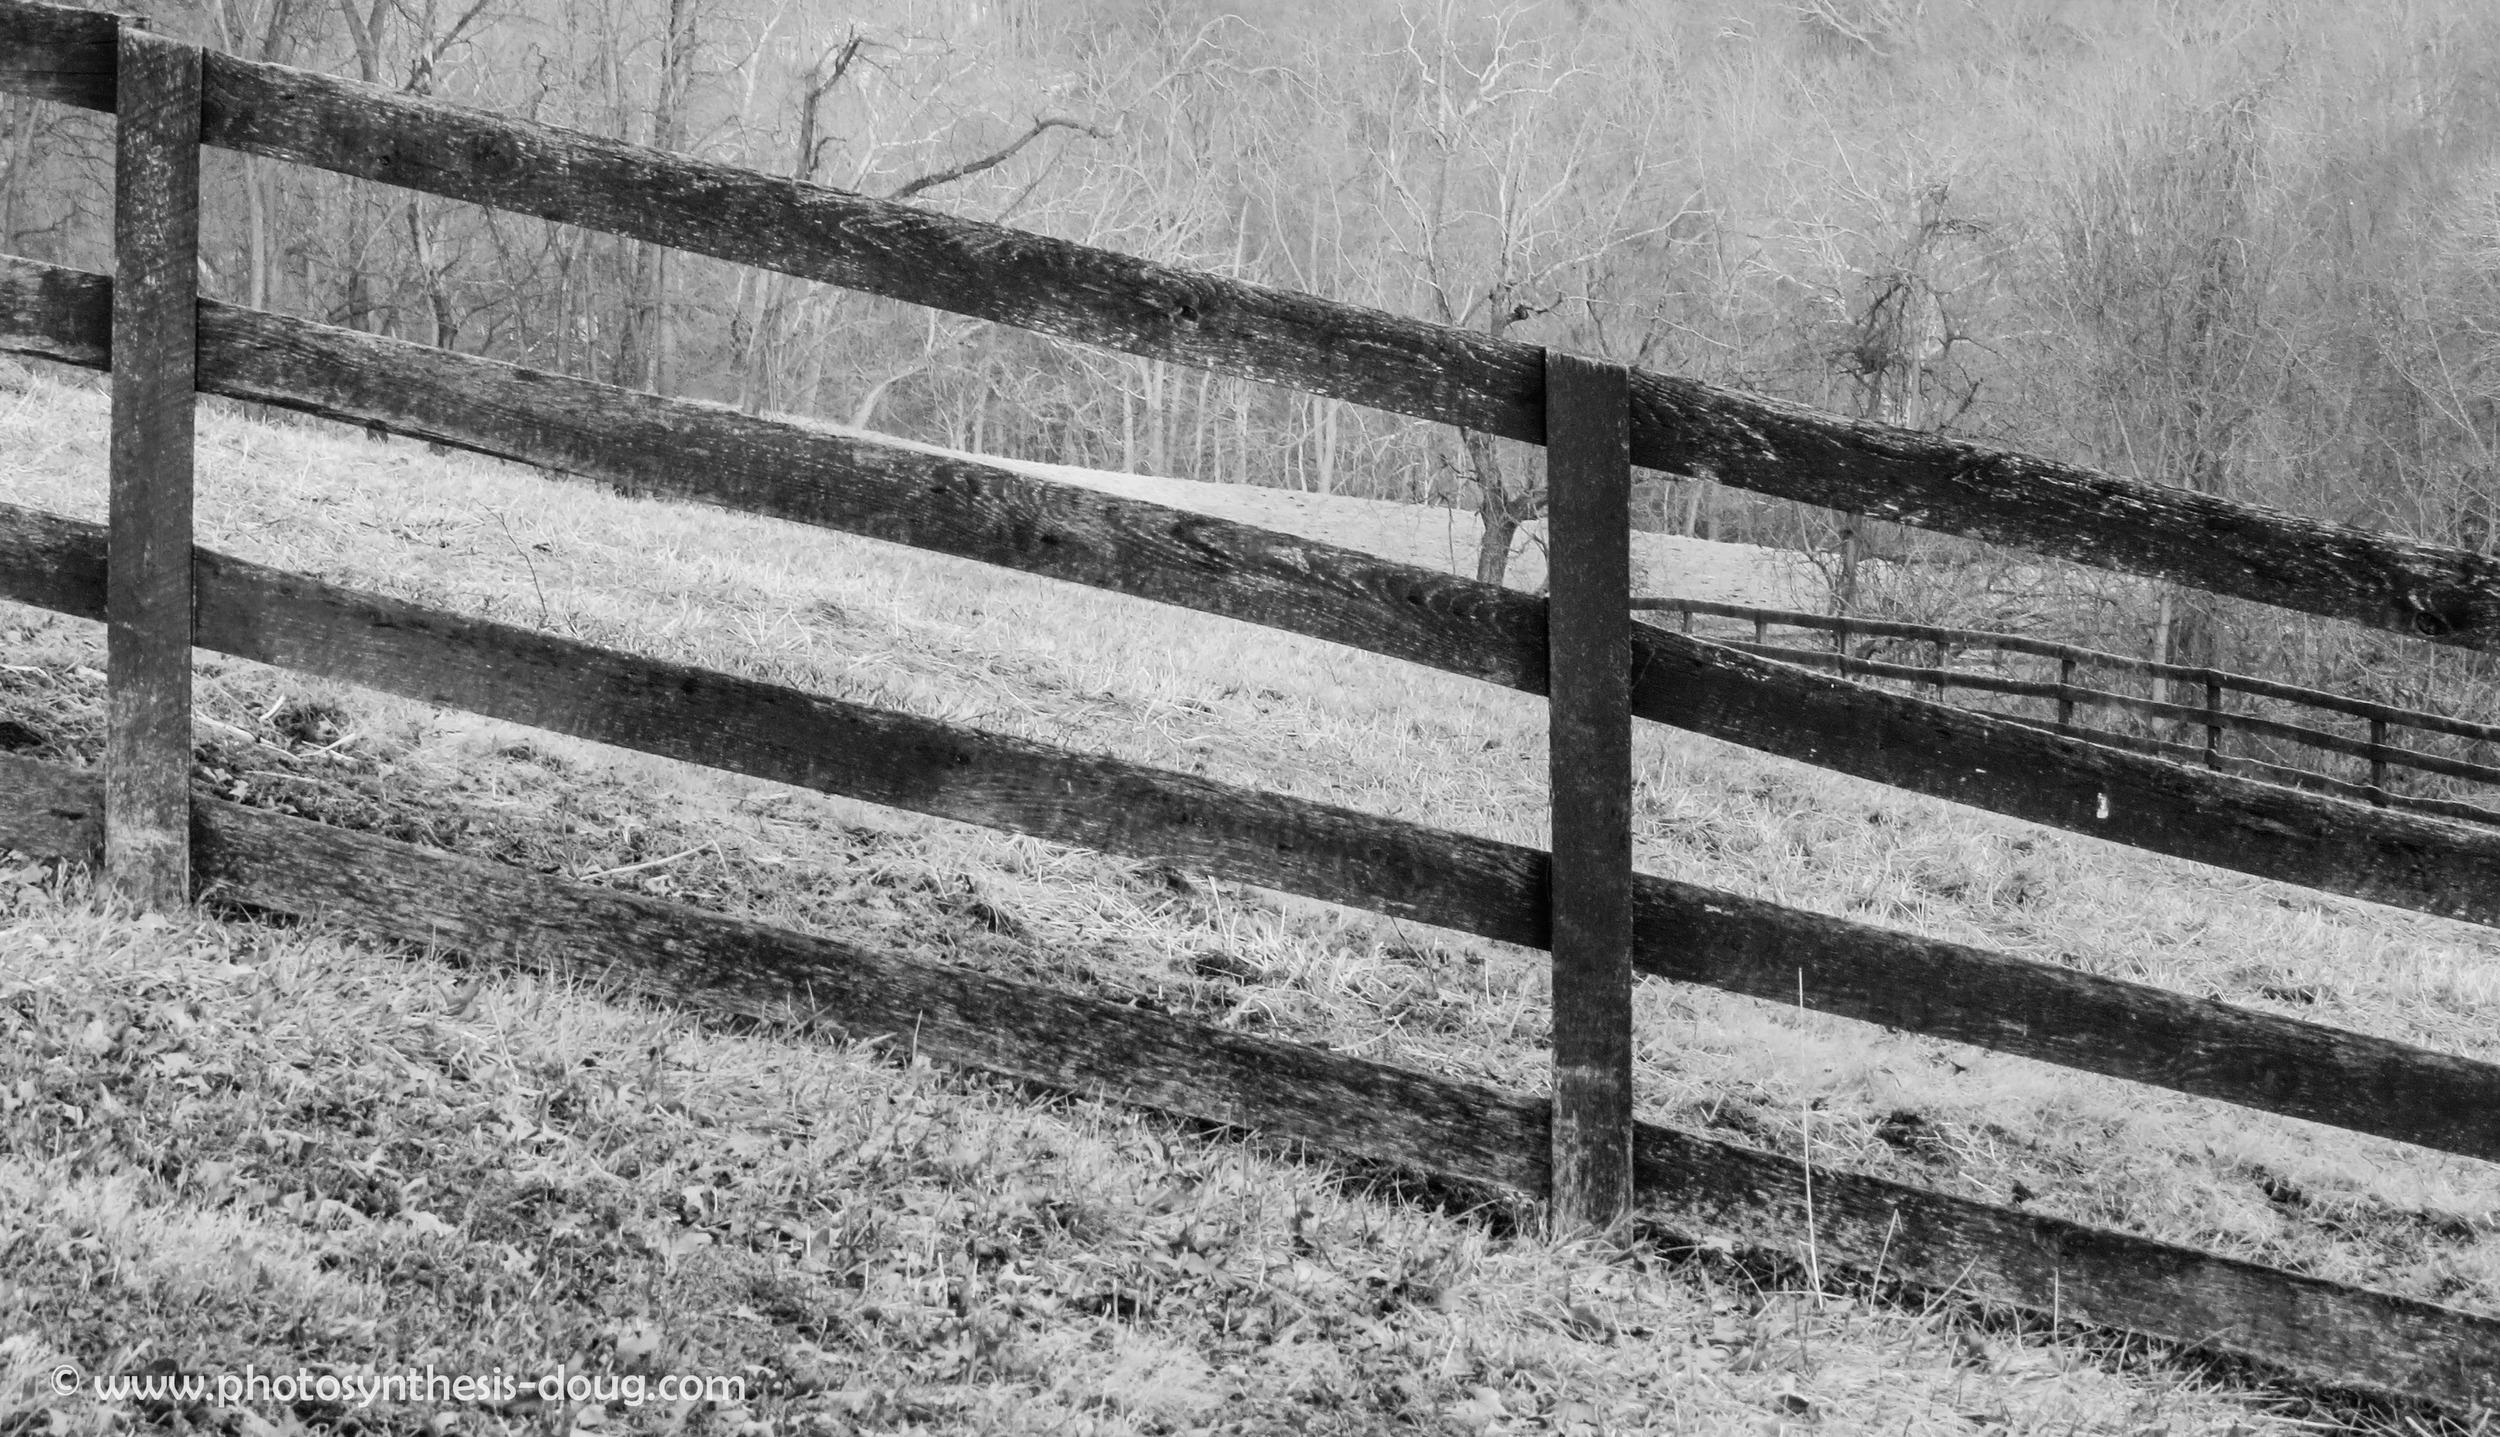 sunset fence 2 b&w-6672.JPG